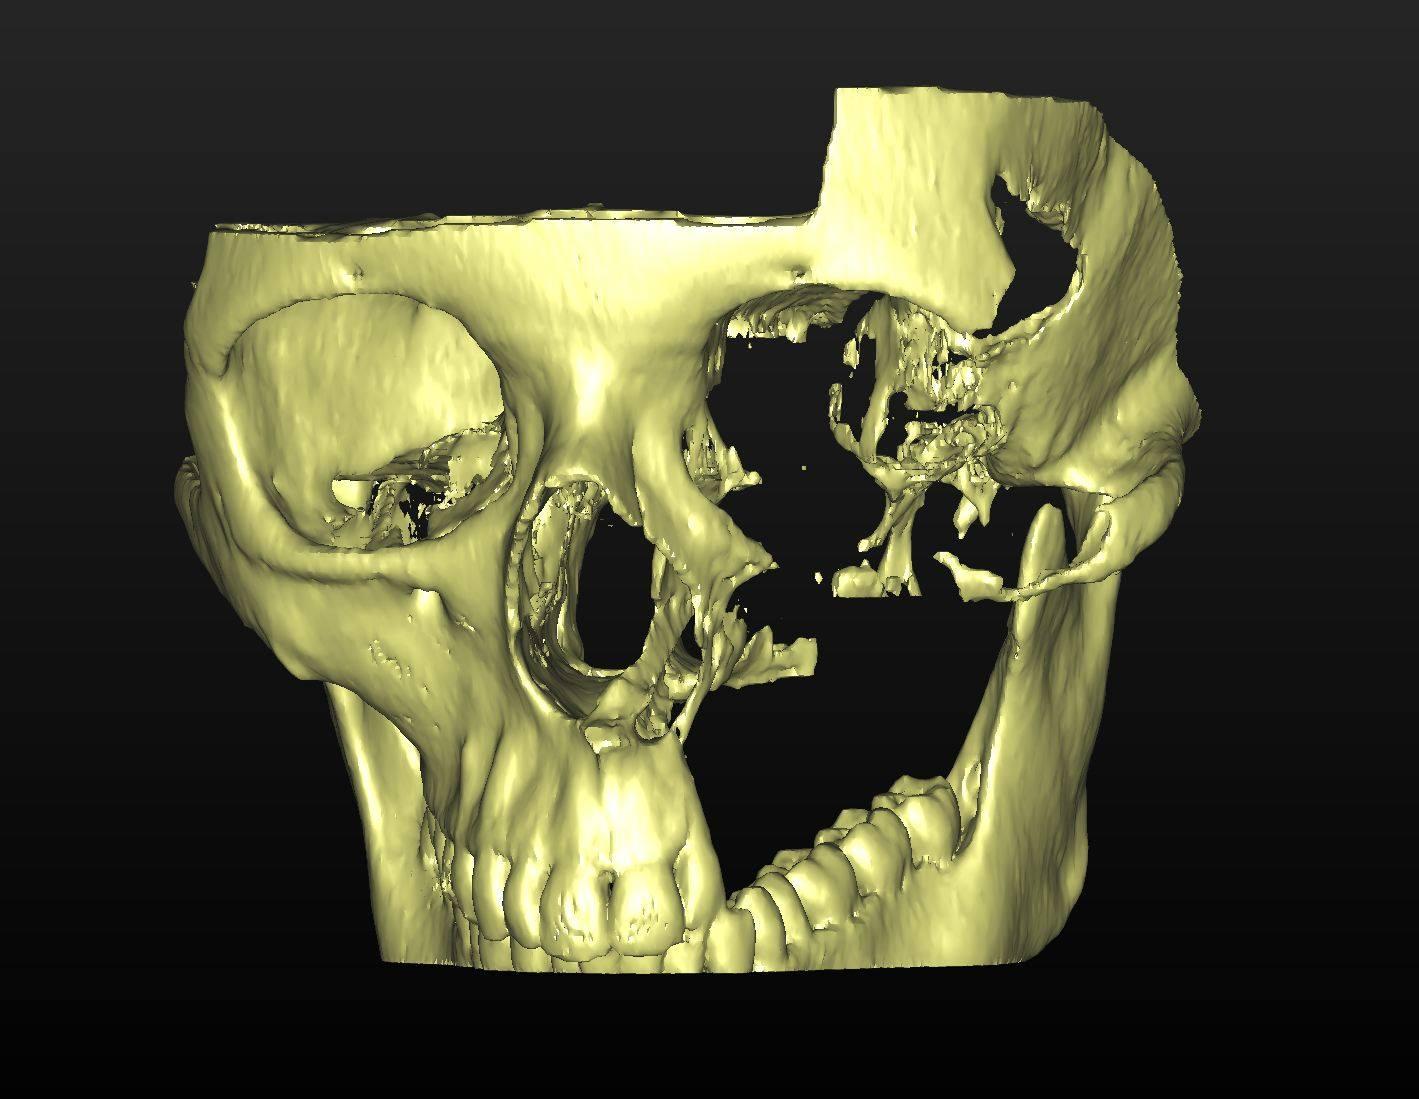 3D модель черепа с реконструкцией и сегментацией